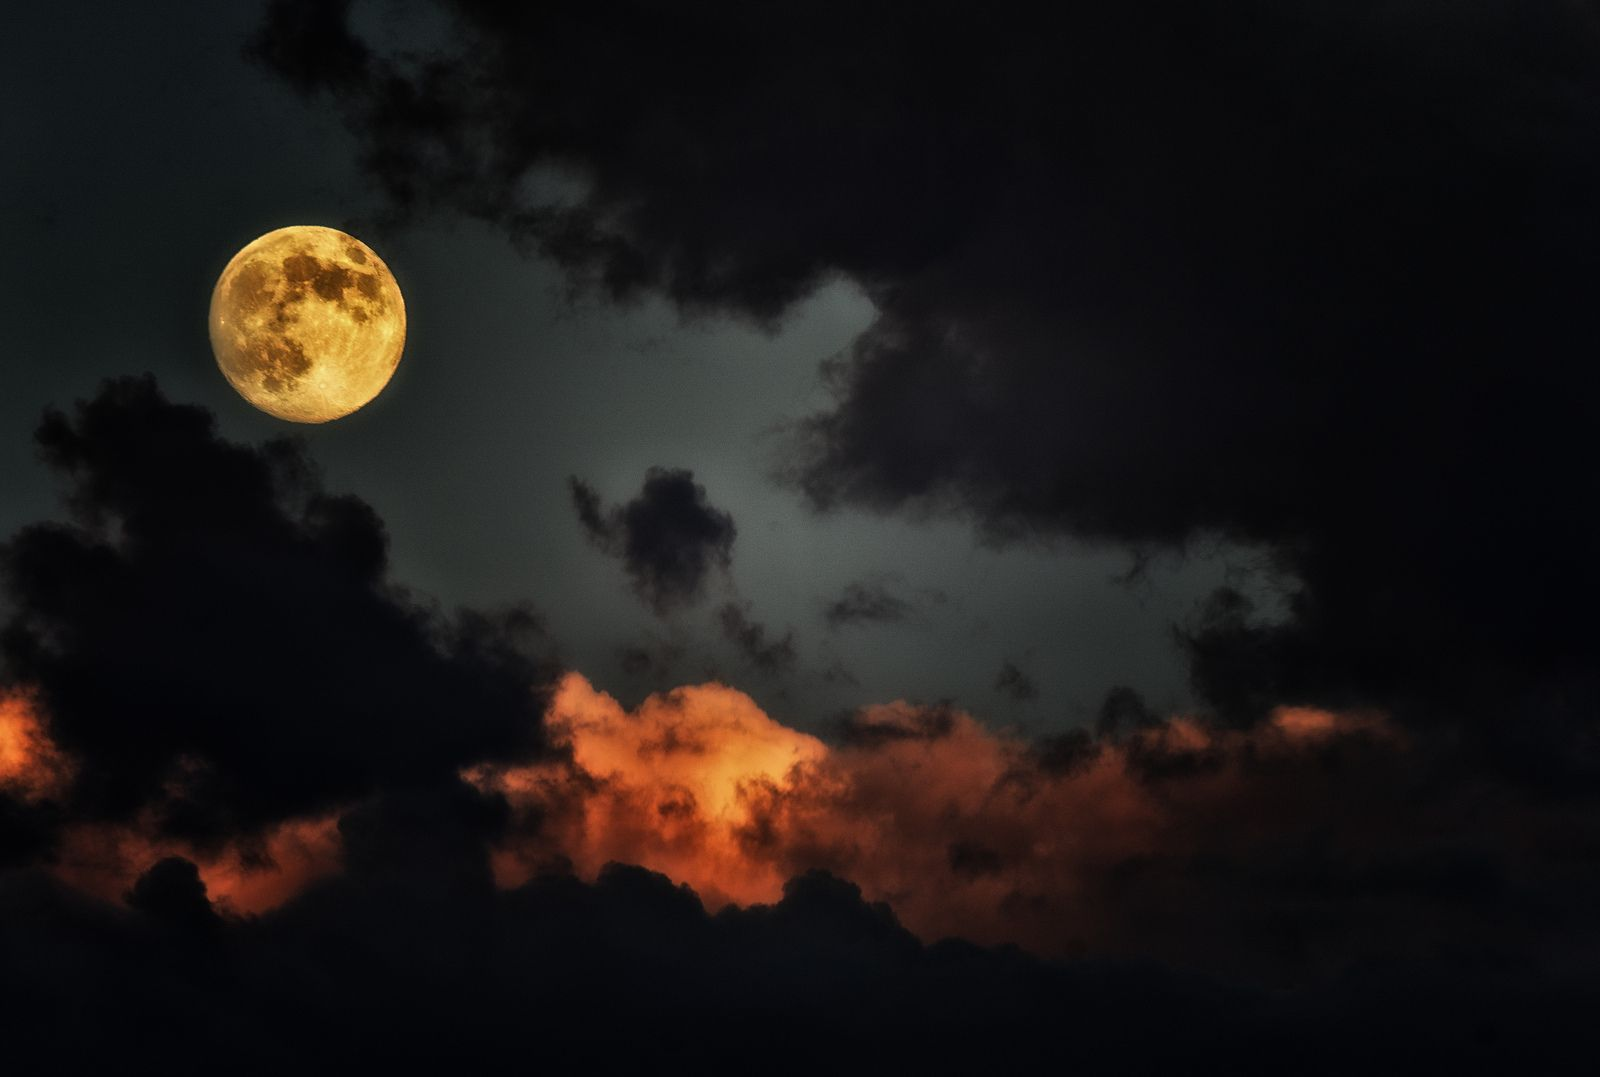 https://flic.kr/p/fySaeb | Cloudy | Coyote Hills RP, Fremont, CA